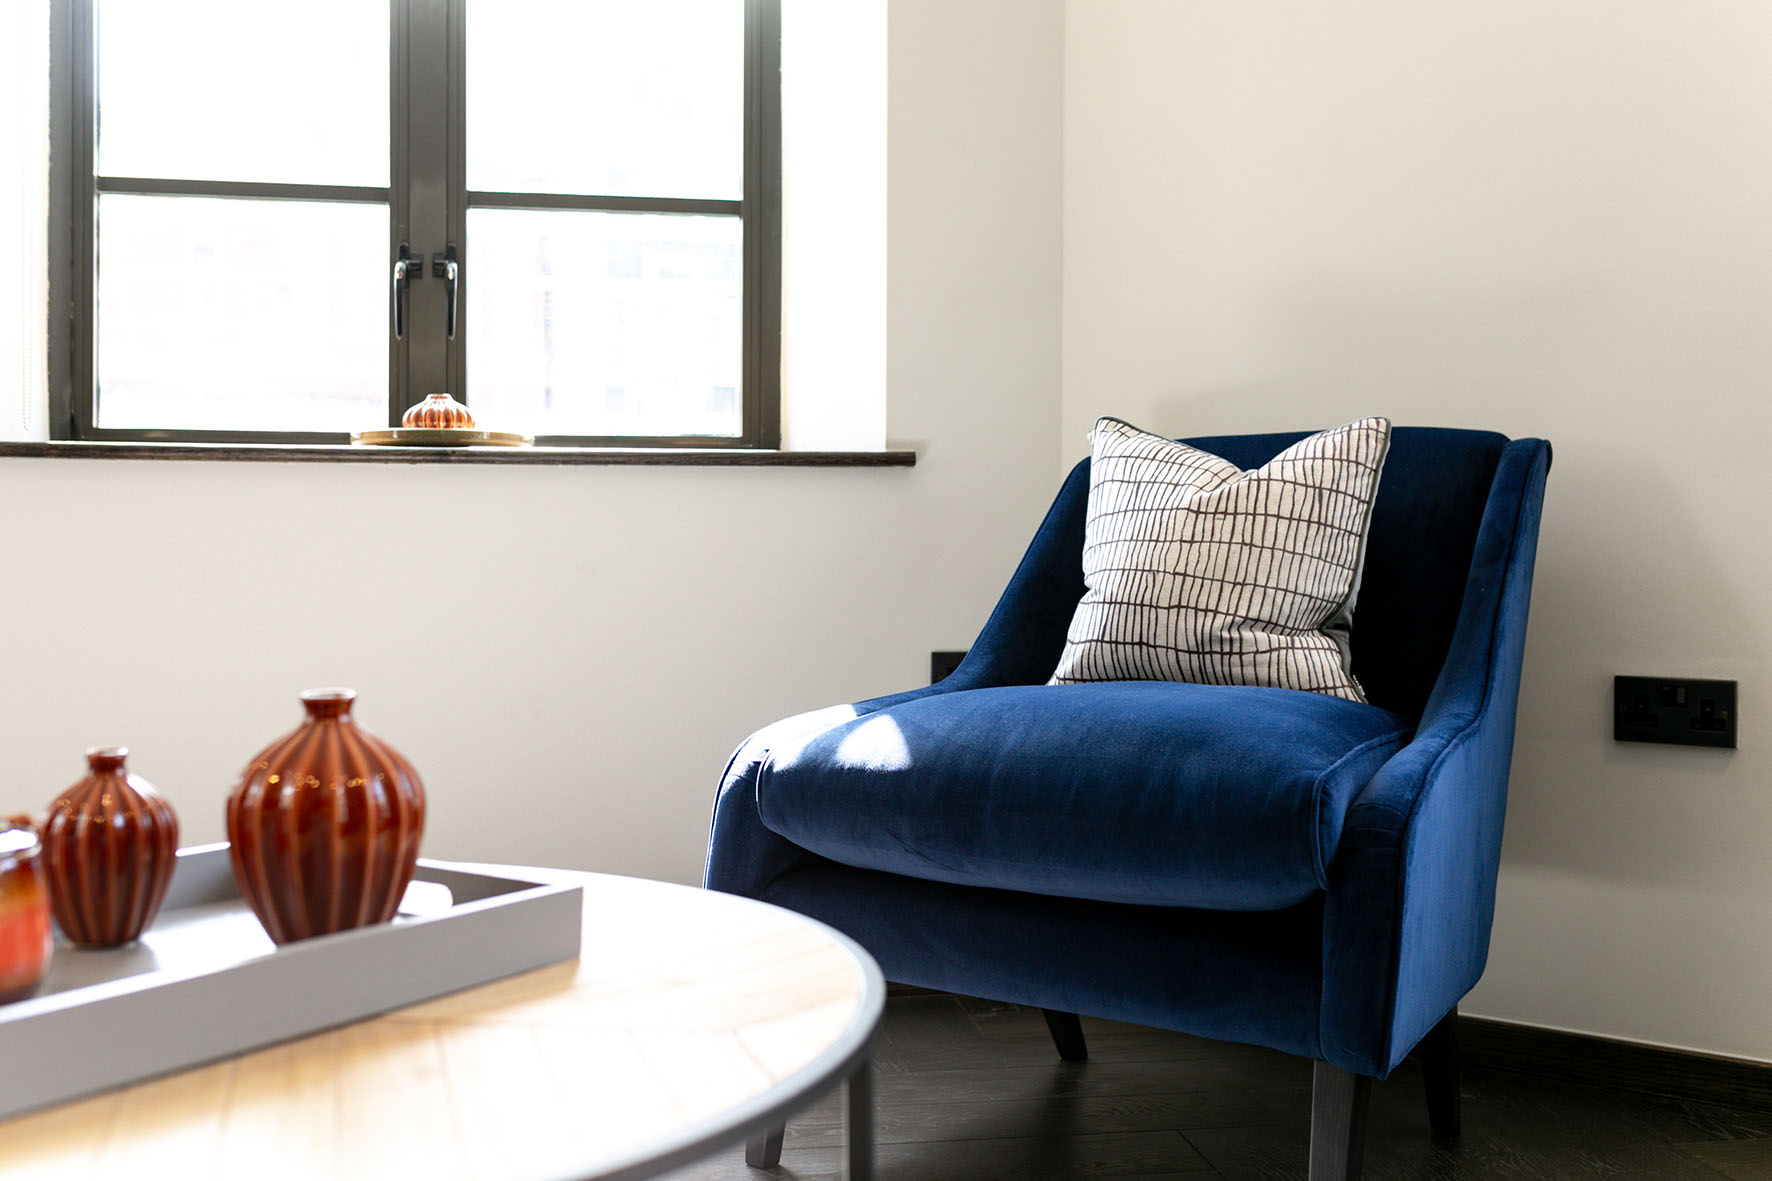 Lovelydays luxury service apartment rental - London - Soho - Oxford Street IV - Lovelysuite - 2 bedrooms - 2 bathrooms - Design - 7a315343cd66 - Lovelydays